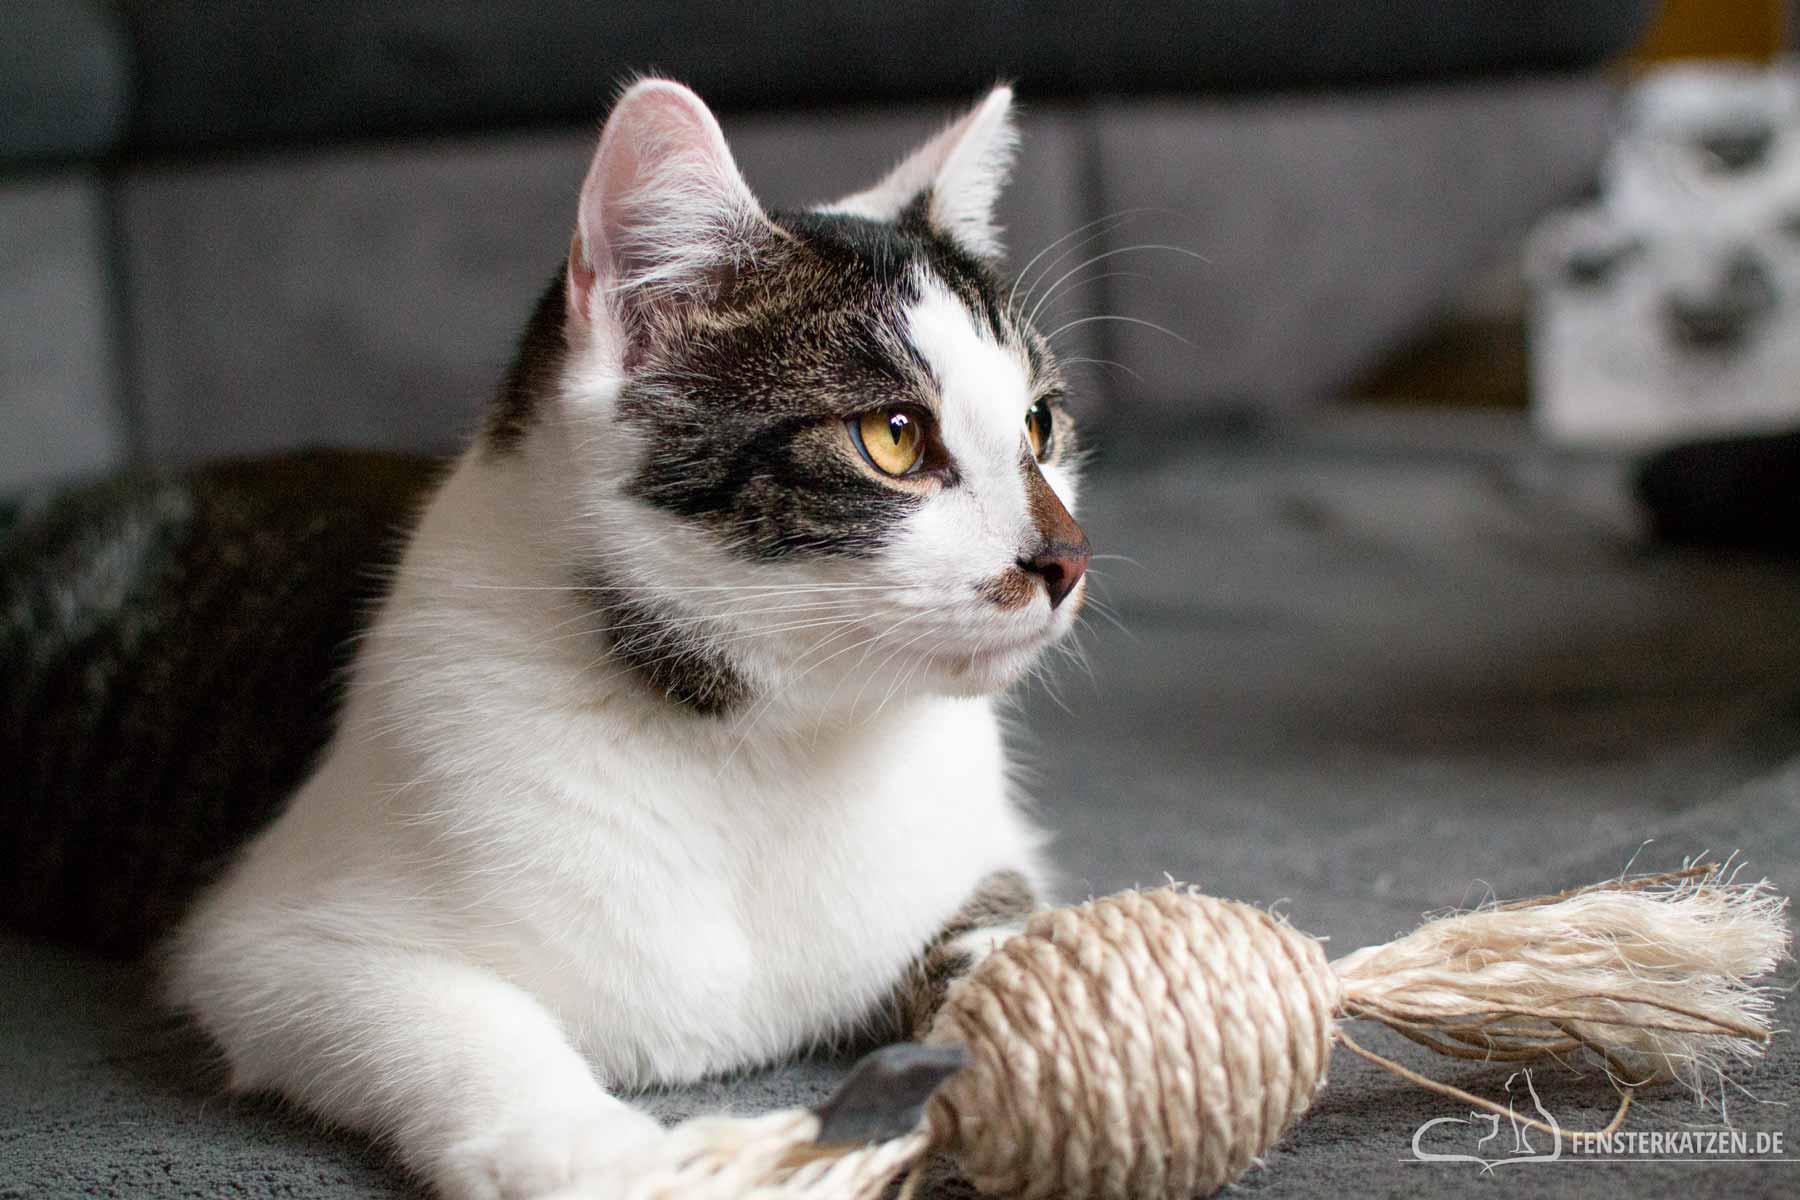 Fensterkatzen-Getestet-Katzenspielzeug-Sisalbonbon-XL-Leylahs-Sisaltraeume-Titelbild